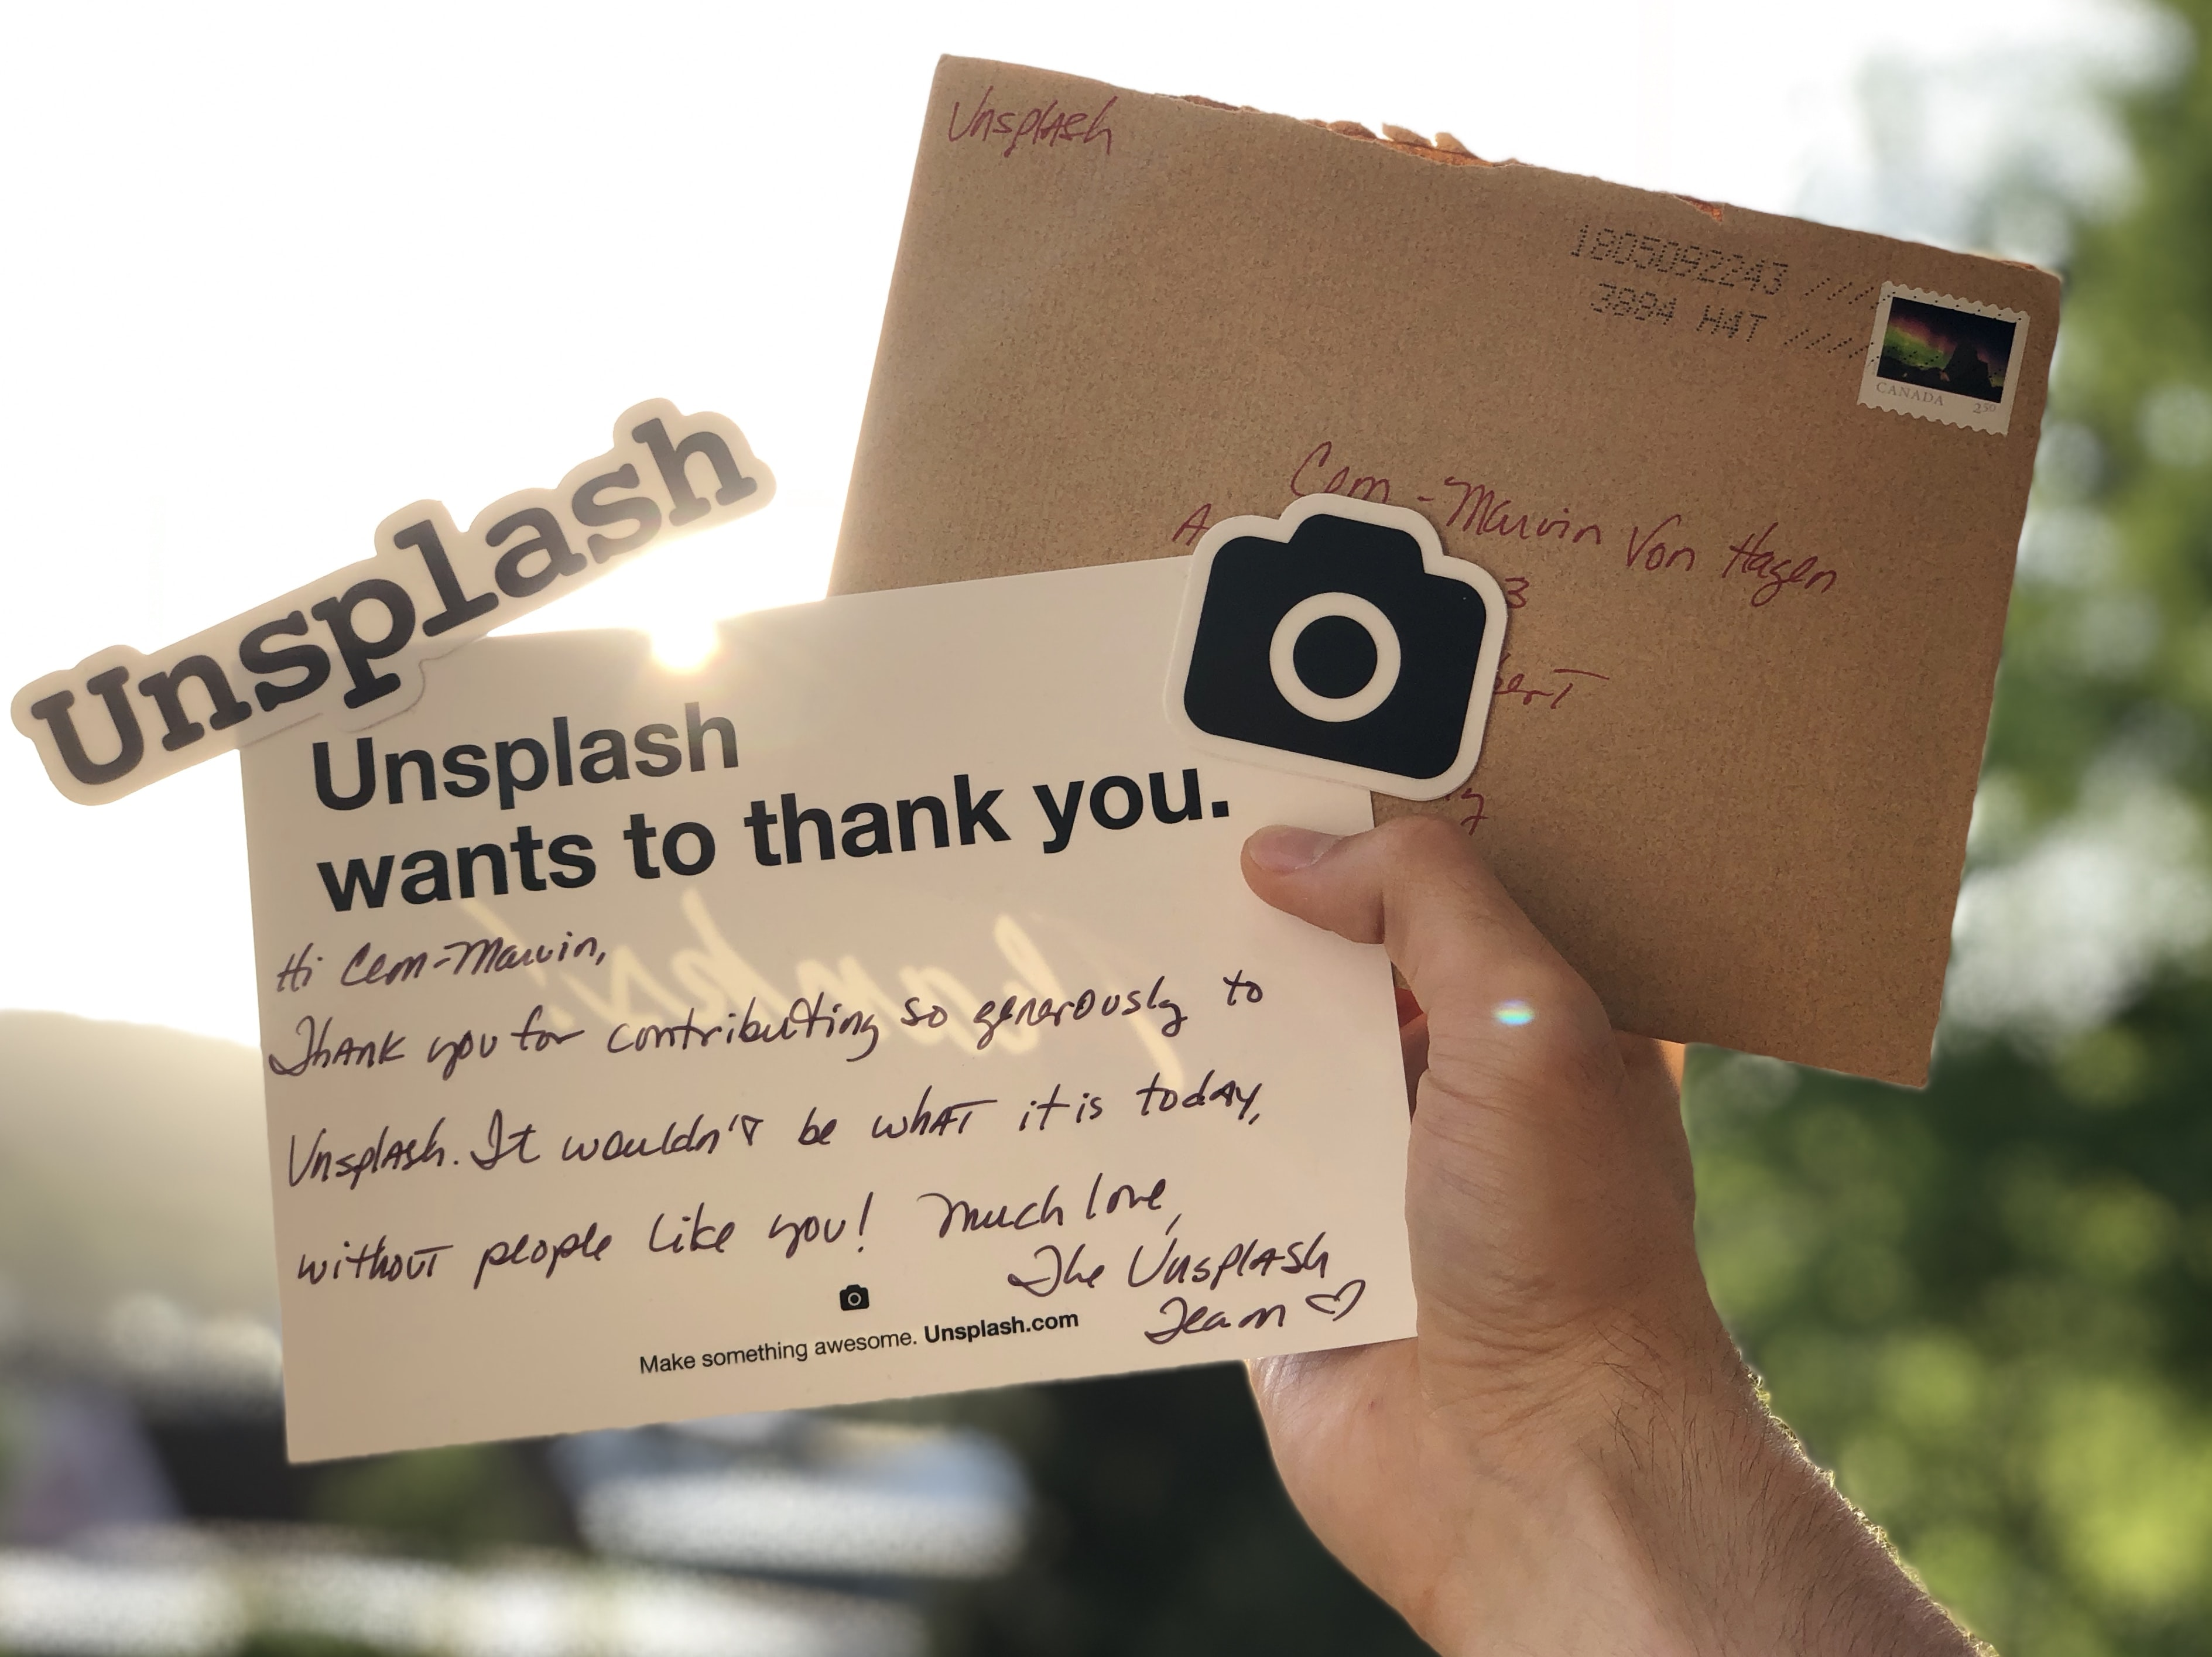 Unsplash wants to thank you signage